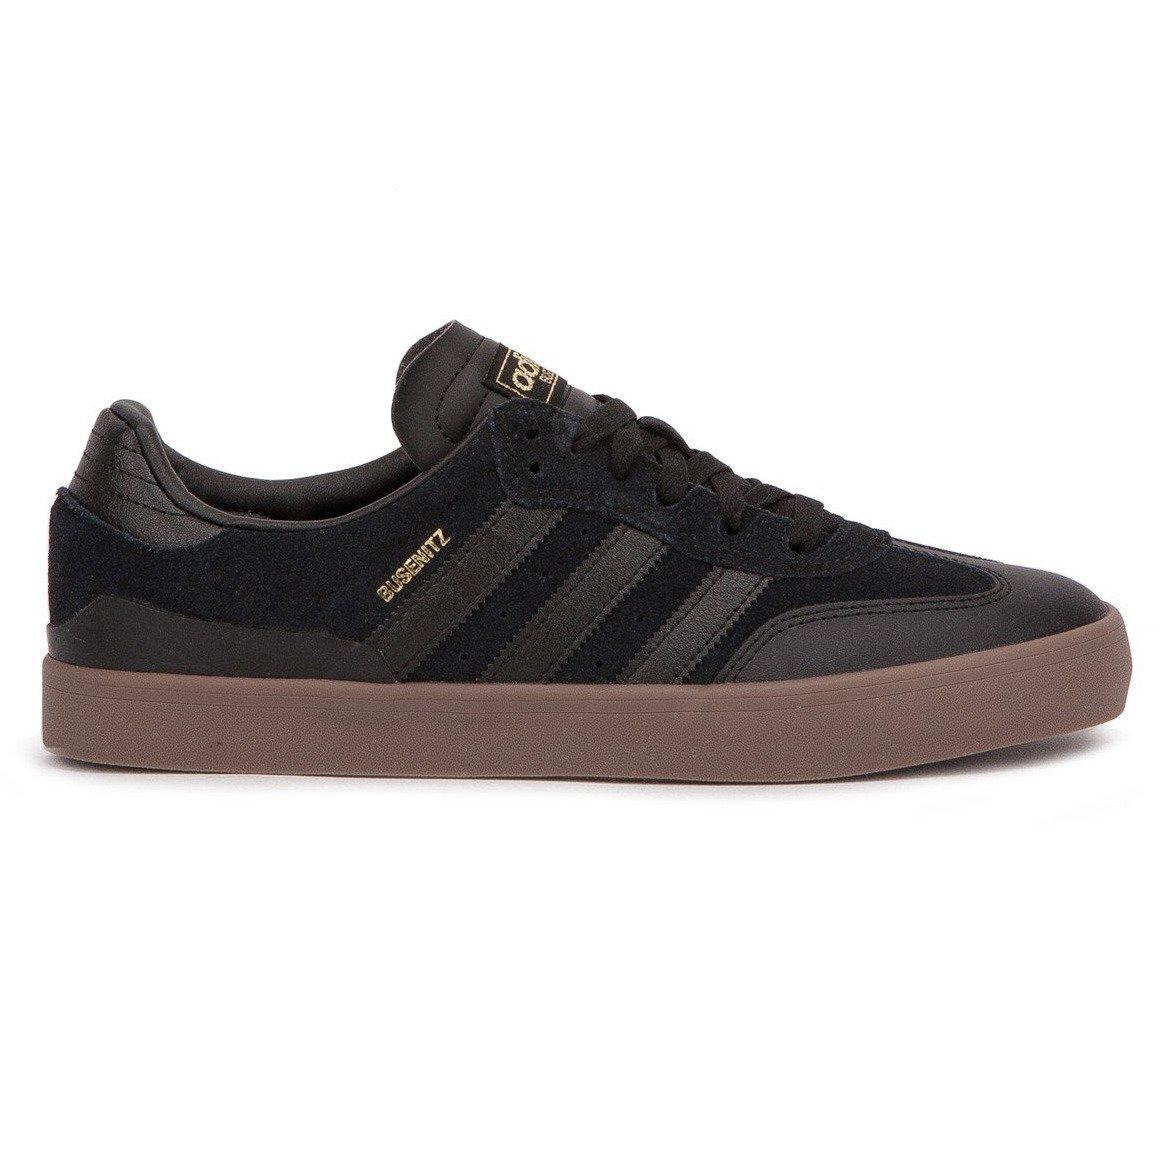 7a05da5d3 Miniramp Skateshop buty adidas busenitz vulc rx (black / gum)